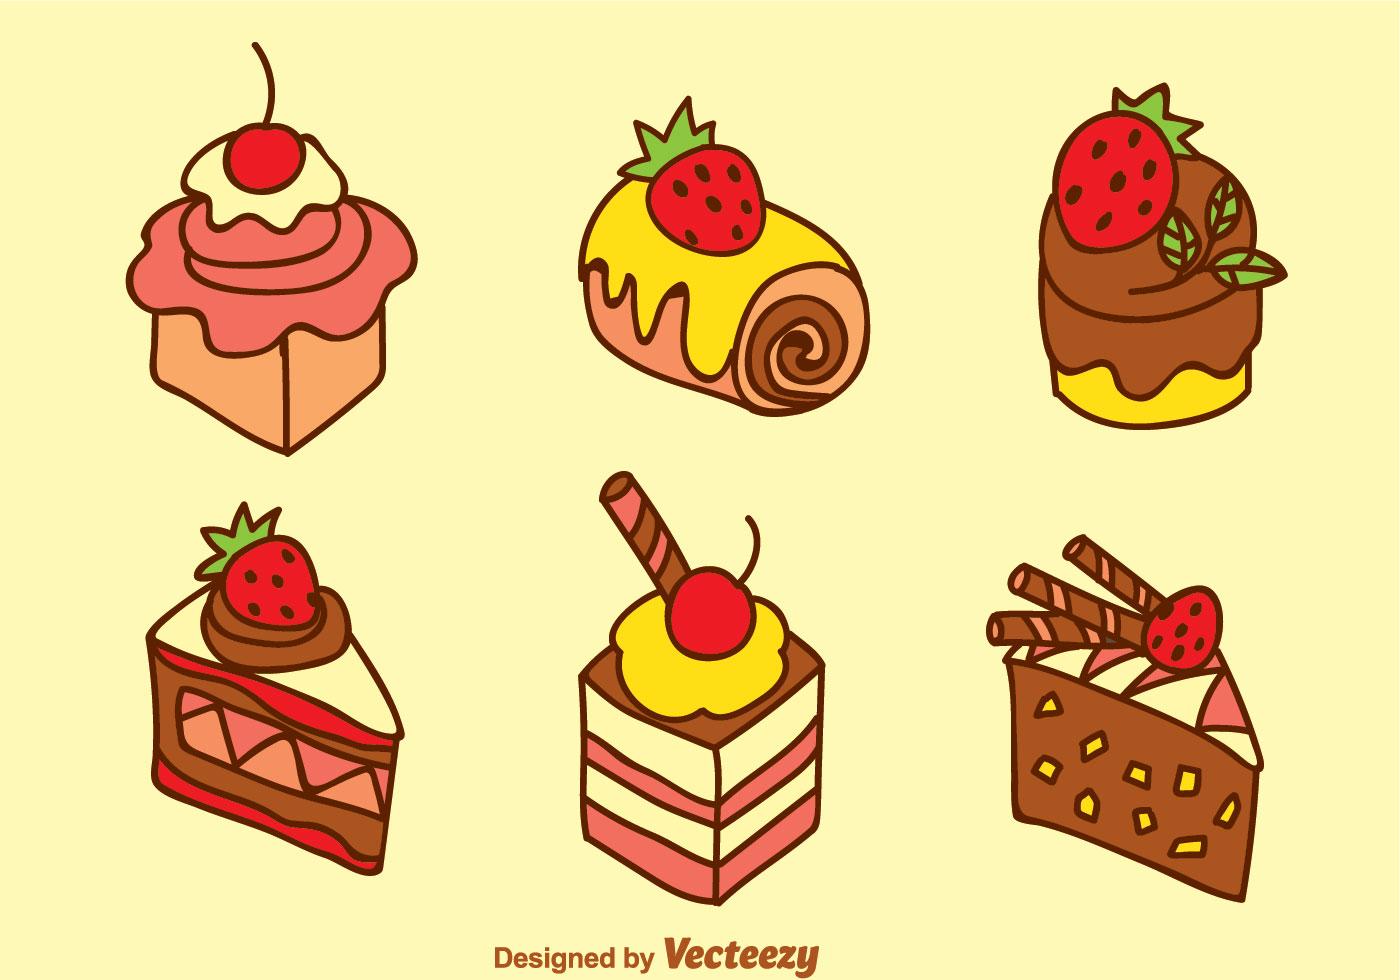 Cake Line Art Vector Free Download : Sweet Cake Vector Set - Download Free Vector Art, Stock ...